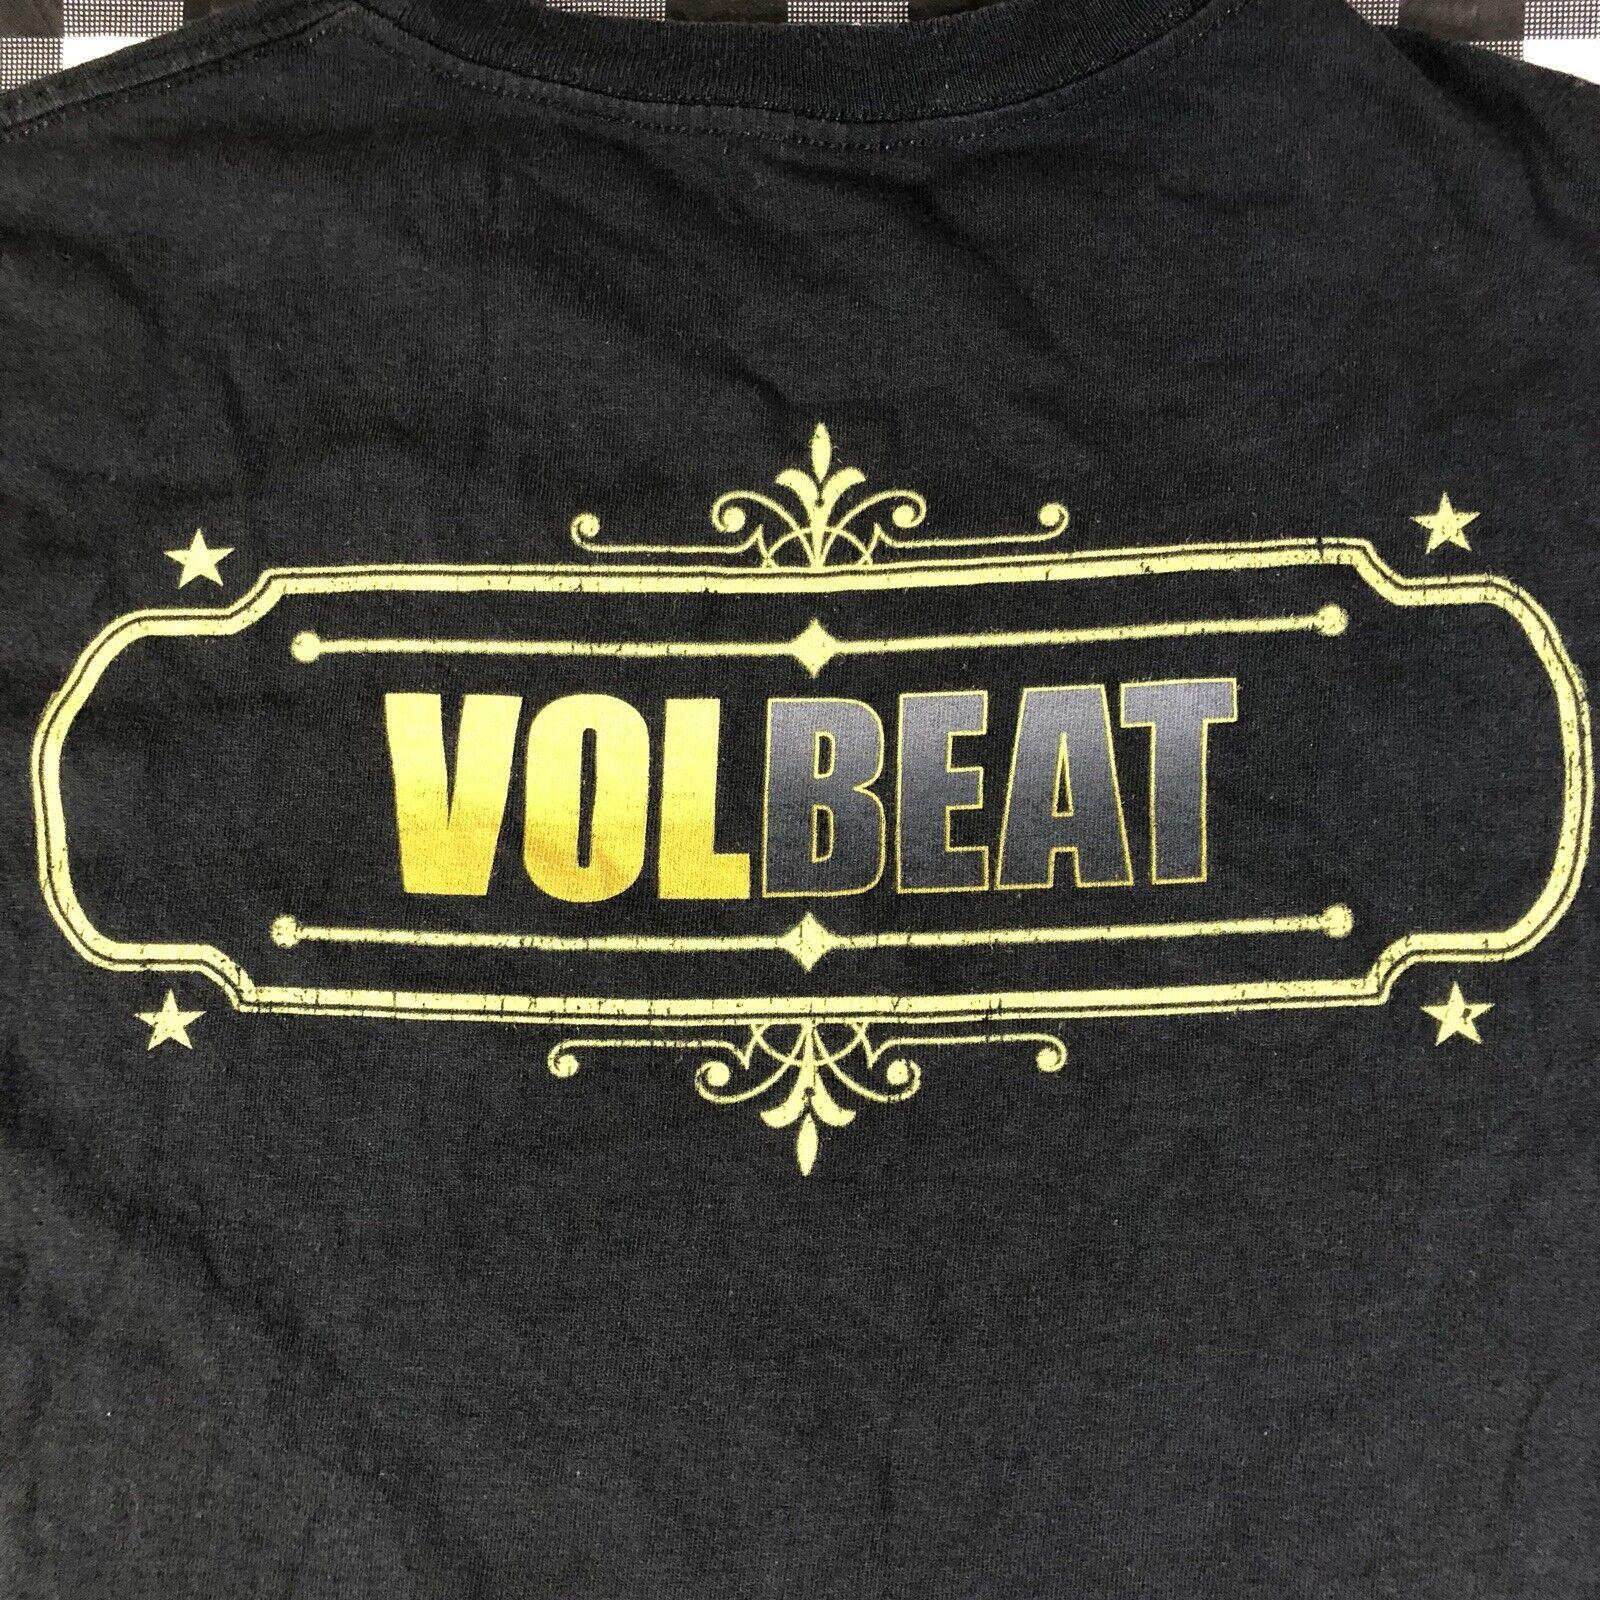 Volbeat Black Bart Outlaw Cowboy Rock Band 2013 T… - image 6